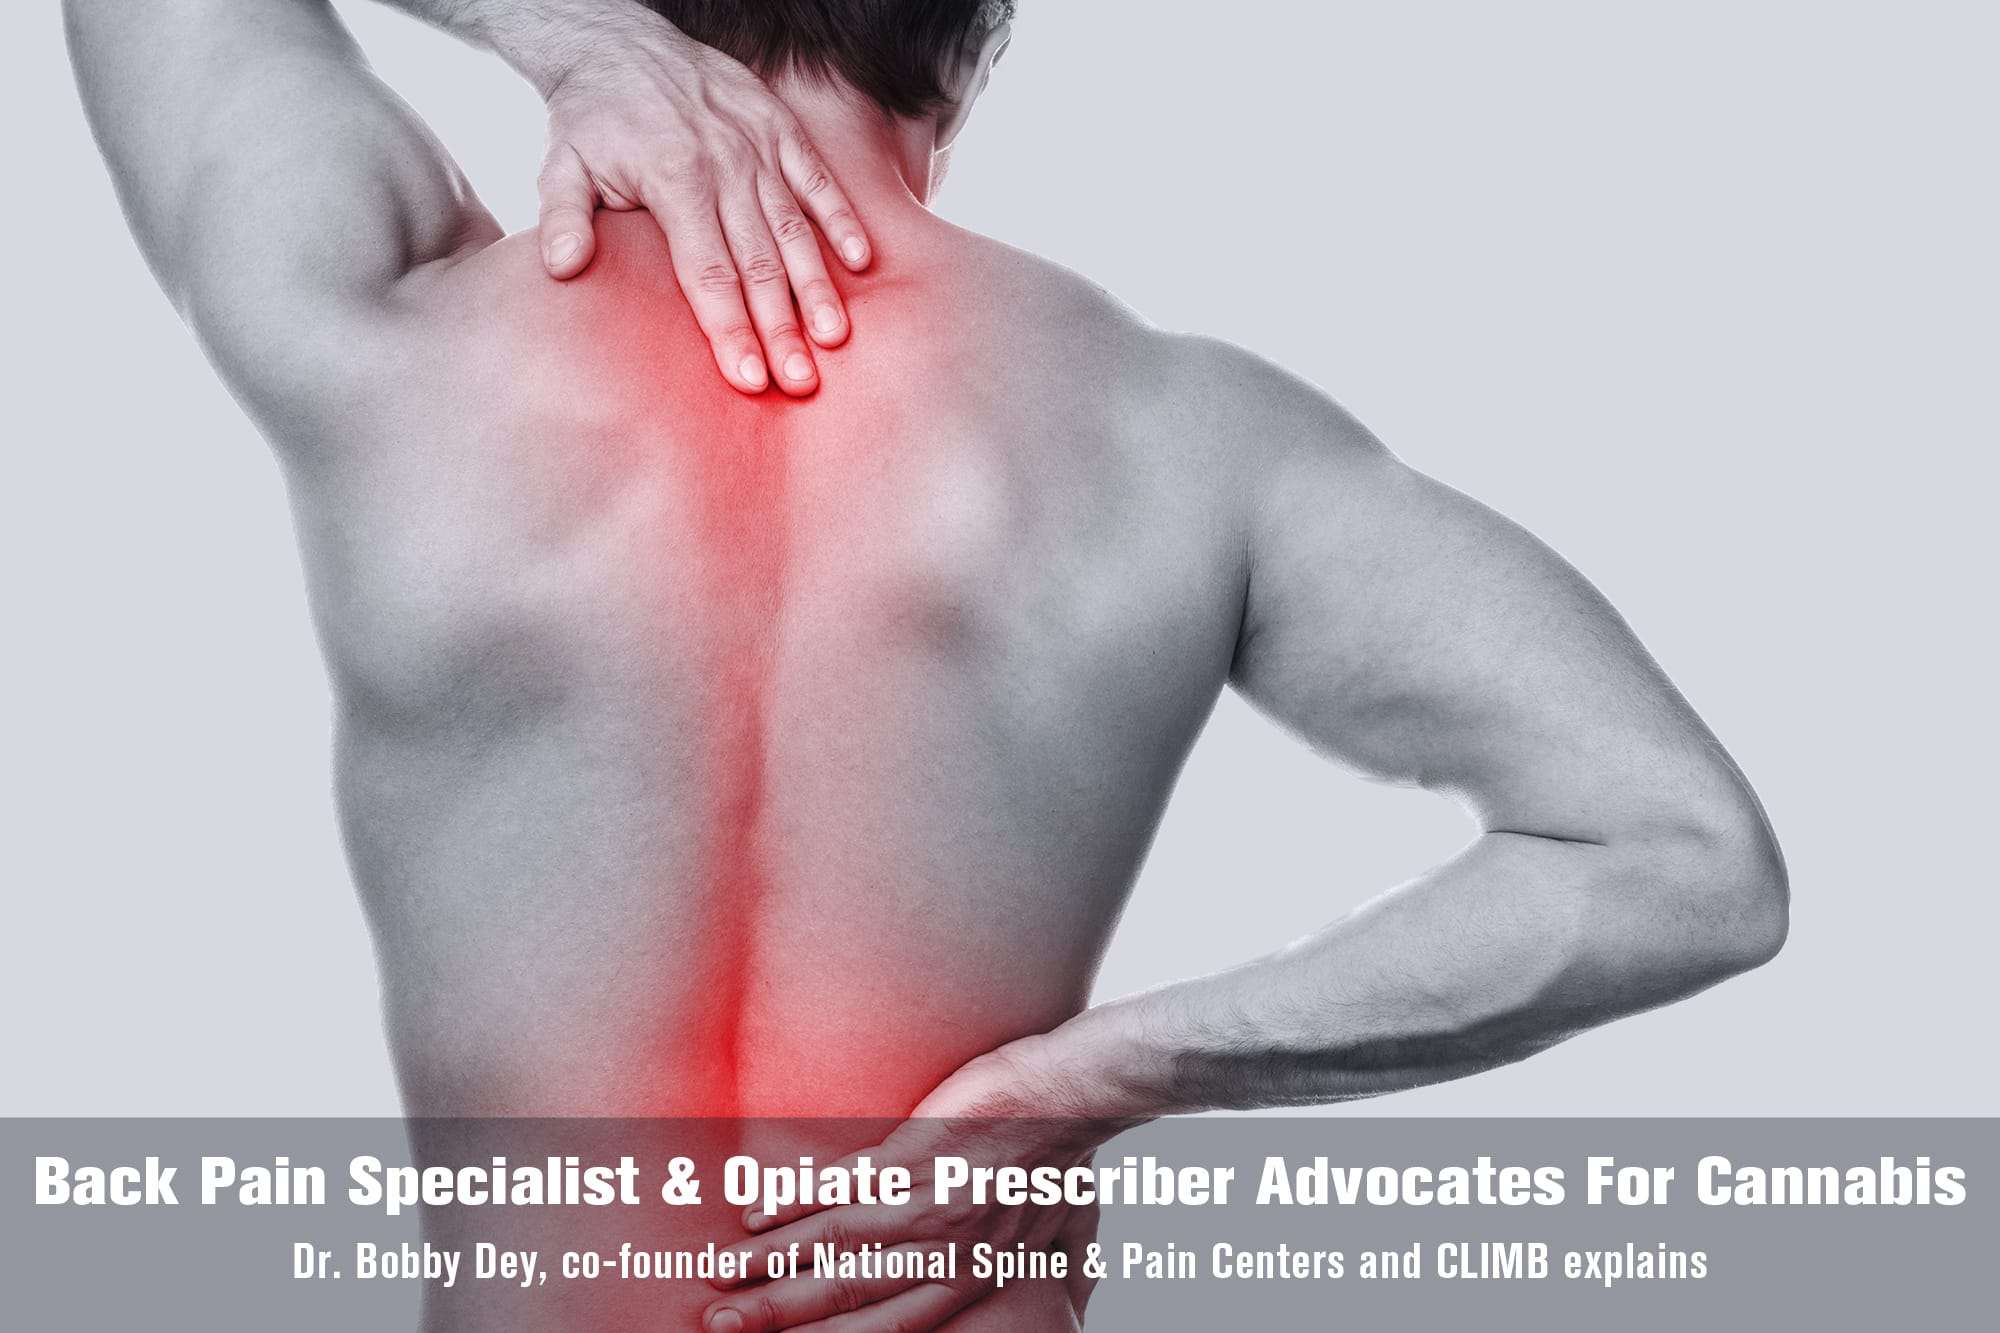 back pain specialist opiate prescriber advocates for cannabis